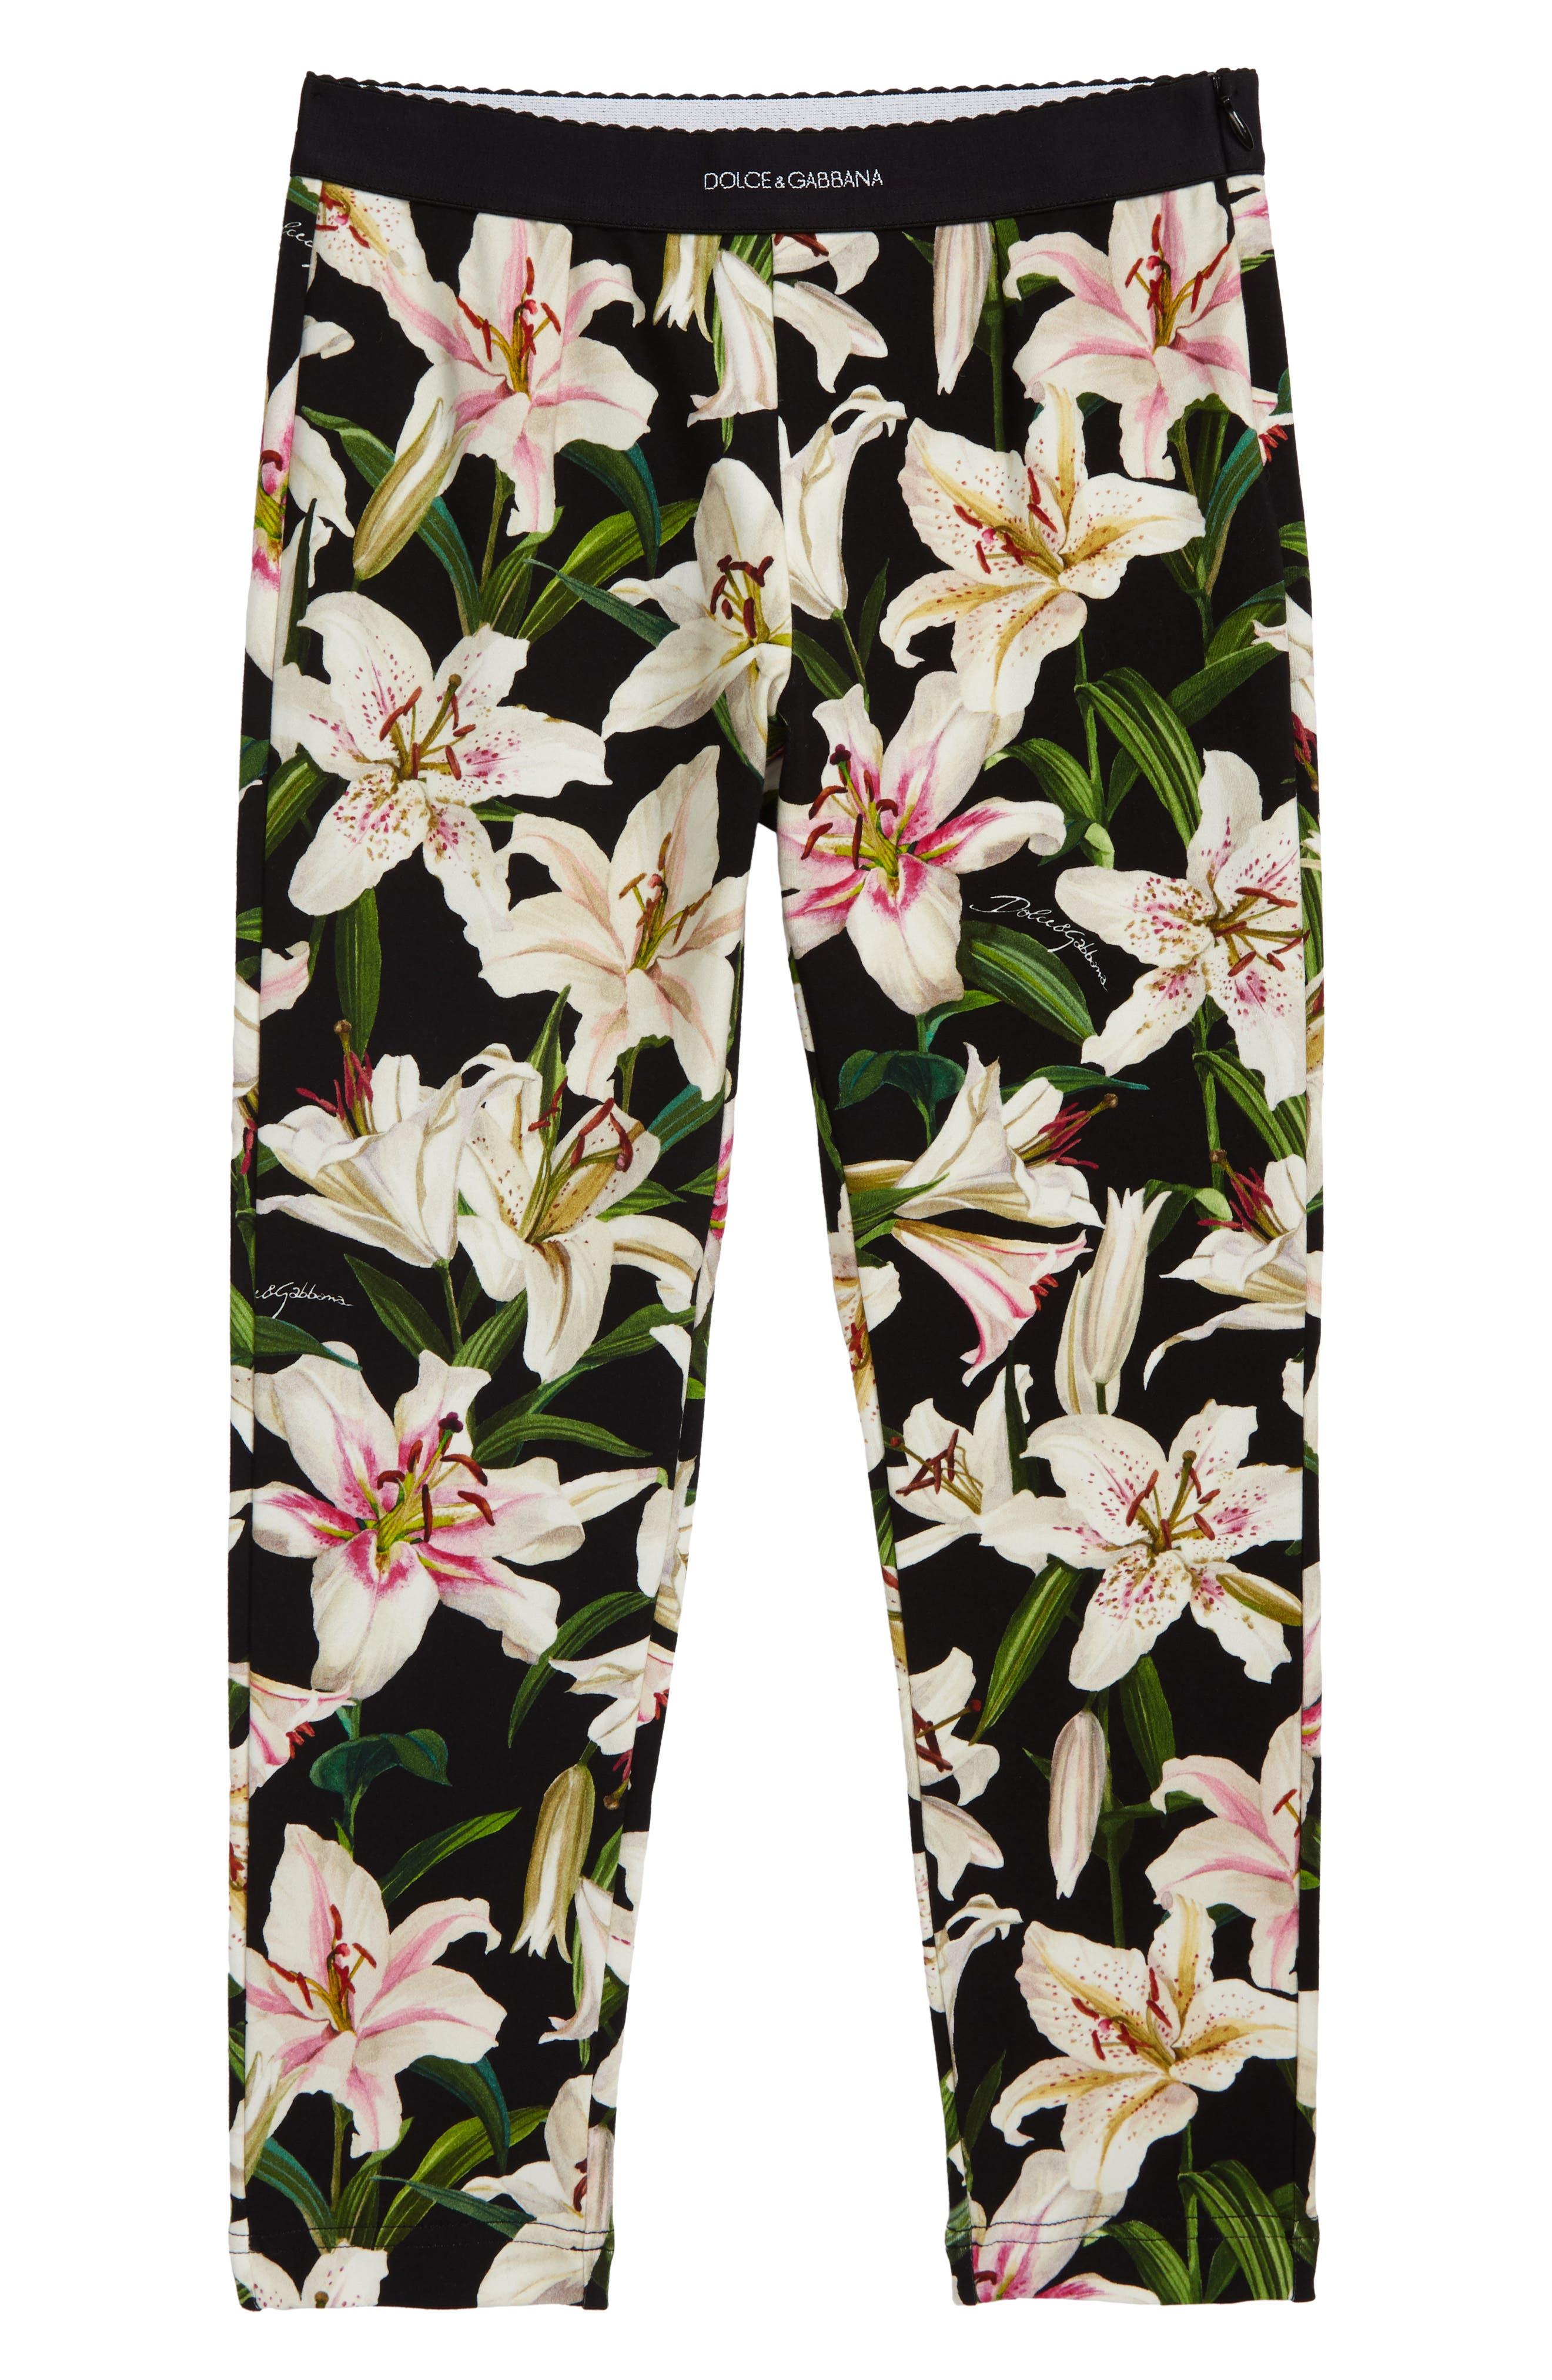 Girls Dolce  gabbana Floral Print Leggings Size 8  White